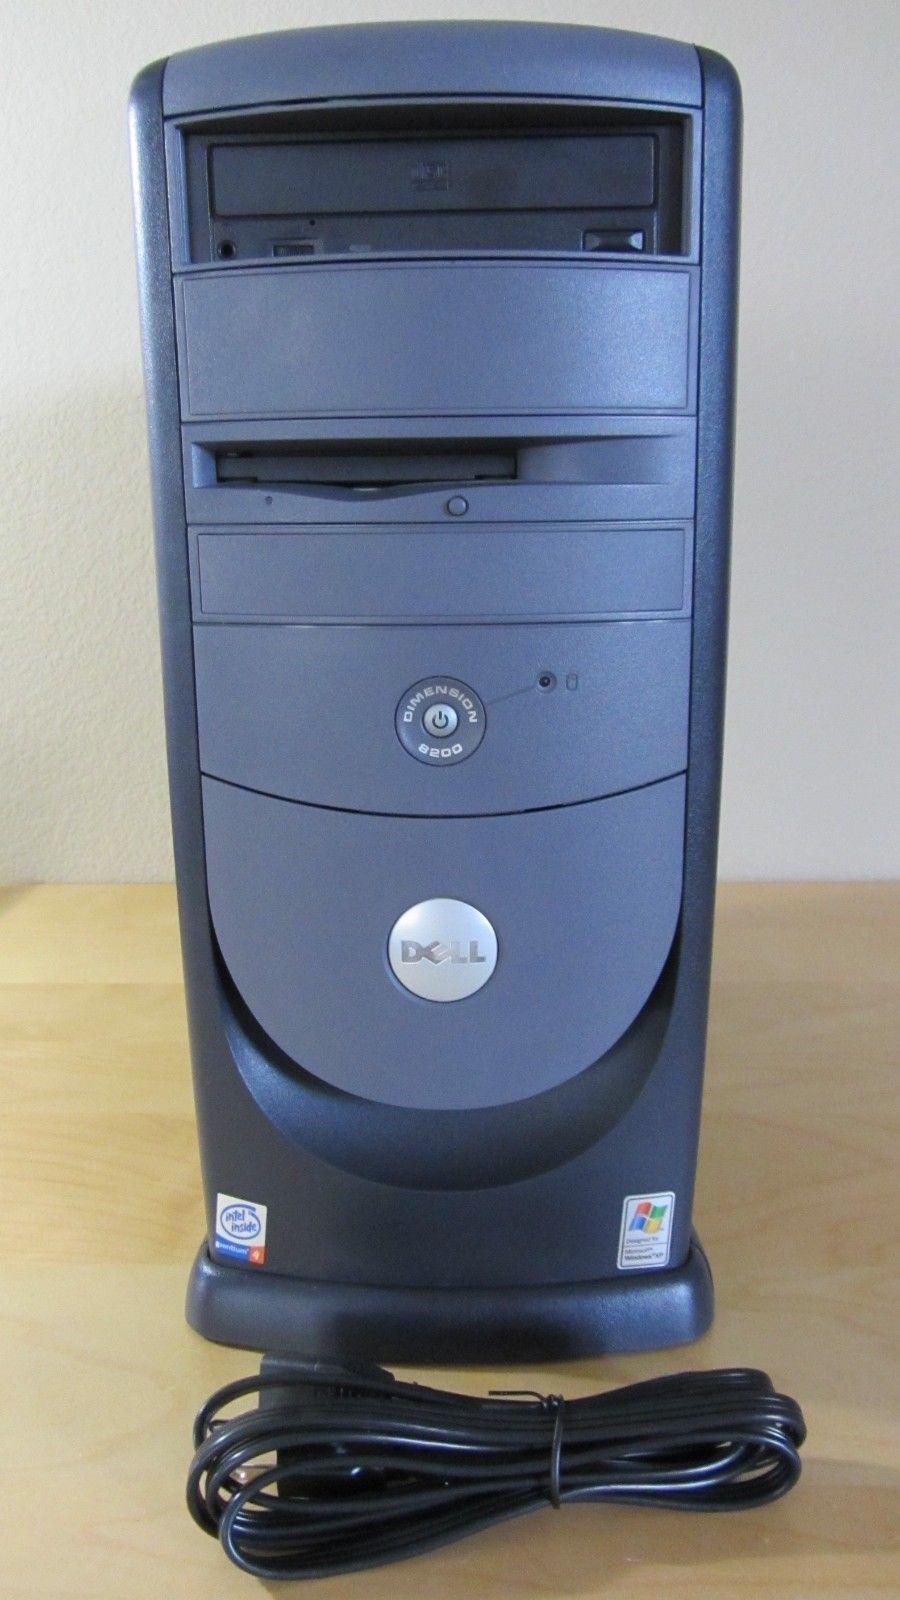 Dell Dimension 8200 P4 1.8GHz 256MB RAM 250GB Hard Drive CD-RW XP Core